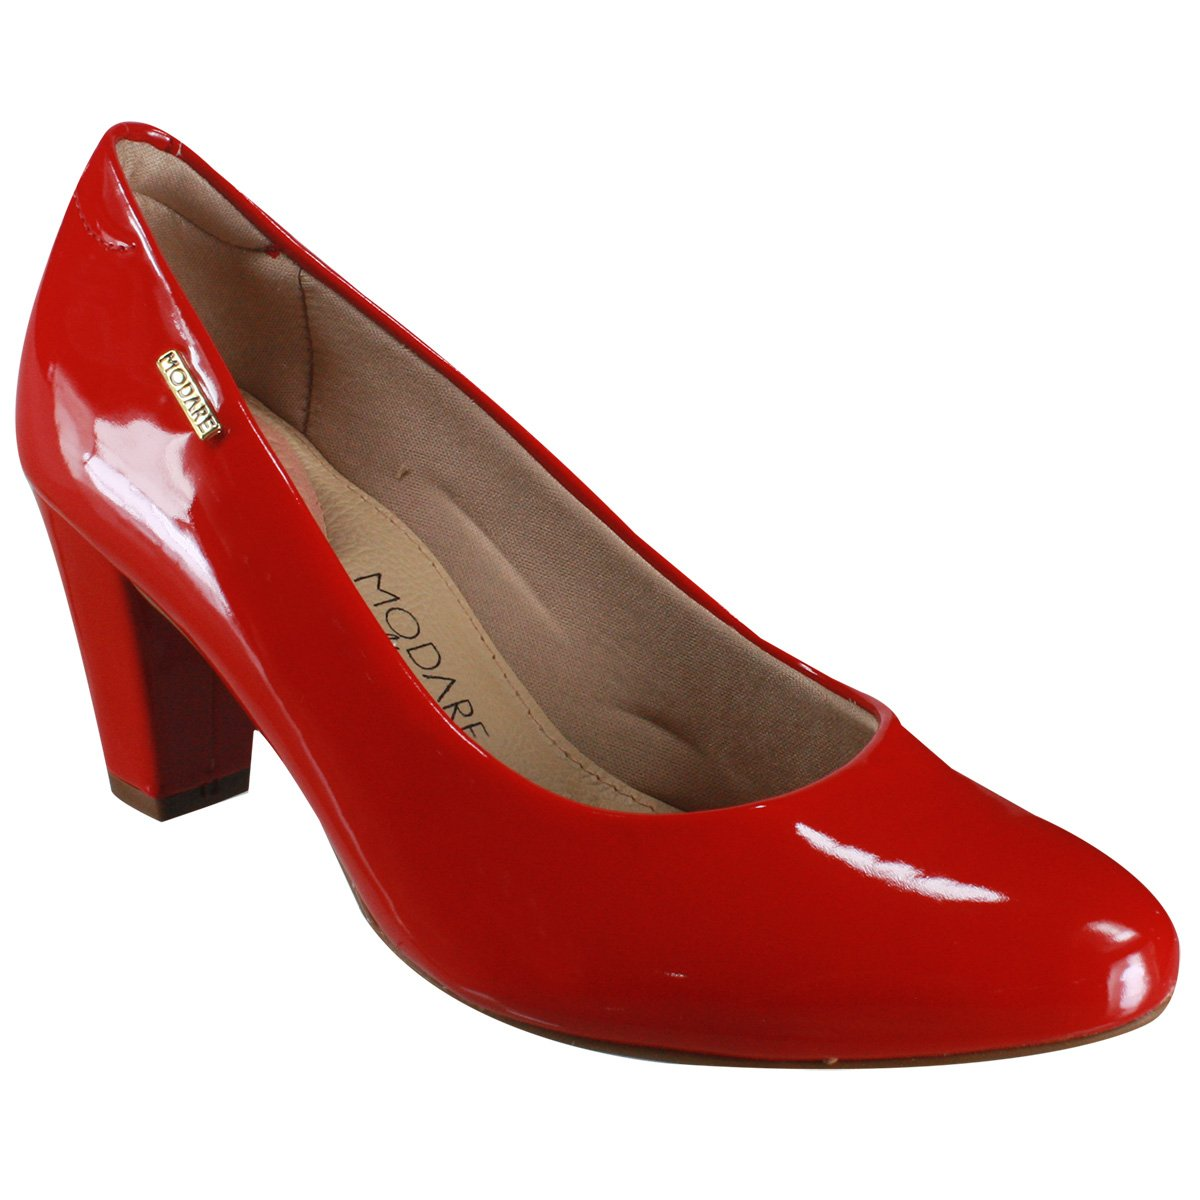 ef023477e Sapato Casual Modare Ultraconforto 7305.100 13488 46175 - Vermelho ...